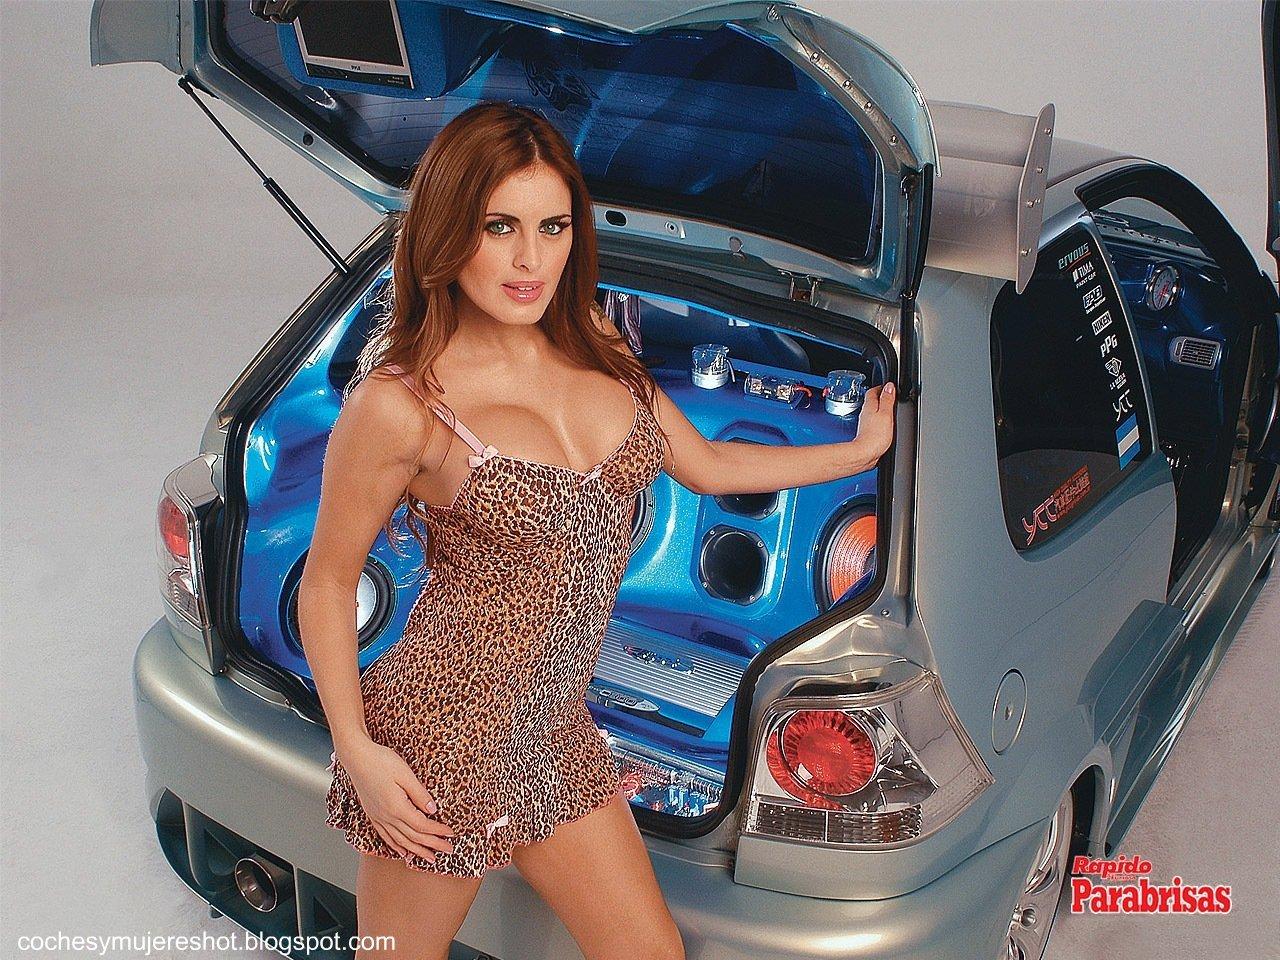 http://2.bp.blogspot.com/-rn-9bK6bIX4/T1tppDKQm4I/AAAAAAAAAu8/6HGPBZ-zWNQ/s1600/tuning-silvina-luna-audio-car-latina-argentina-coches-chicas-wallpapers-custom-753%2B%255Bcochesymujereshot.blogspot.com%255D.jpg